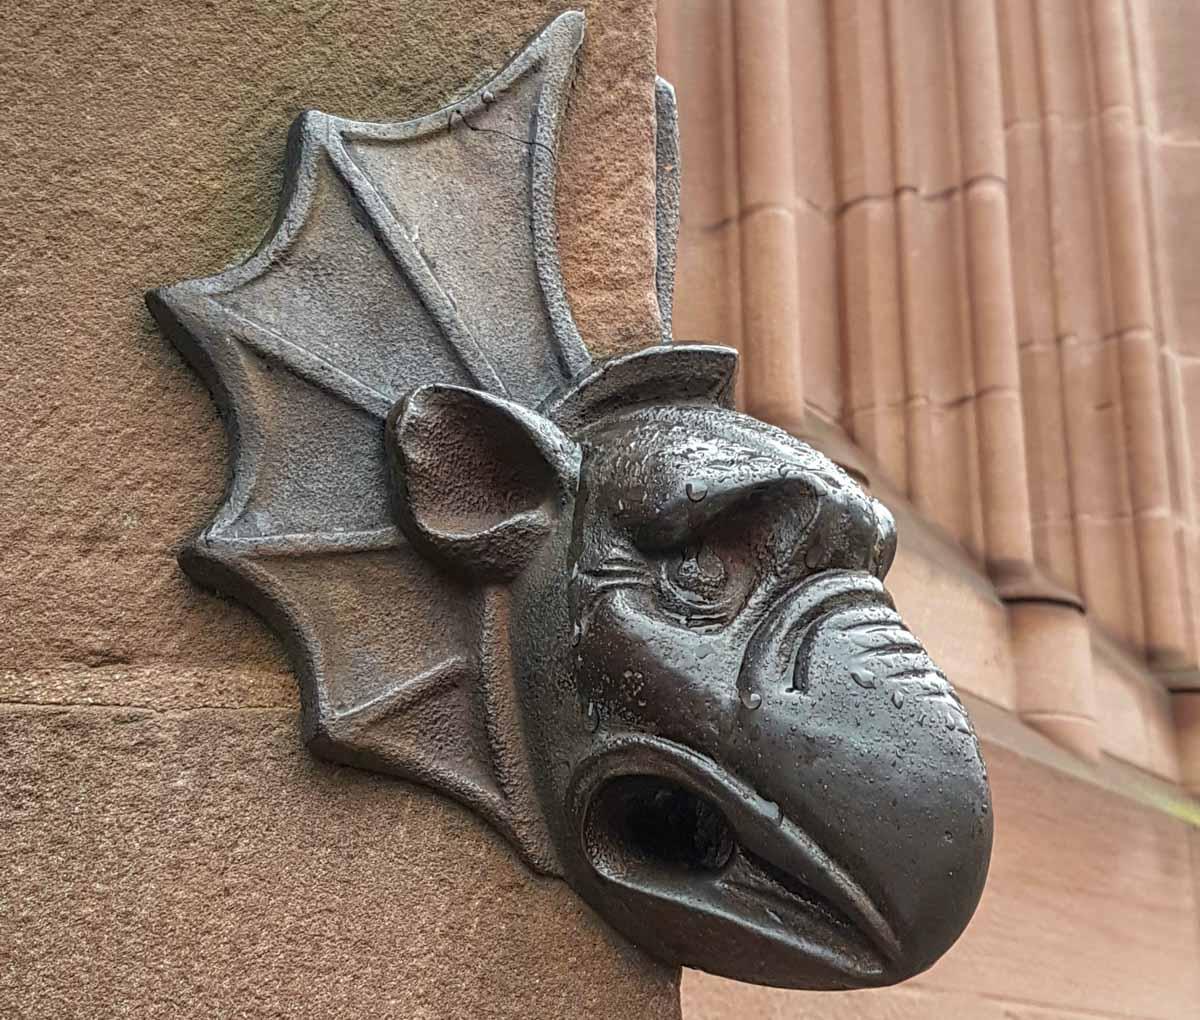 strasbourg-Gargoyle A Magical Christmas in Strasbourg